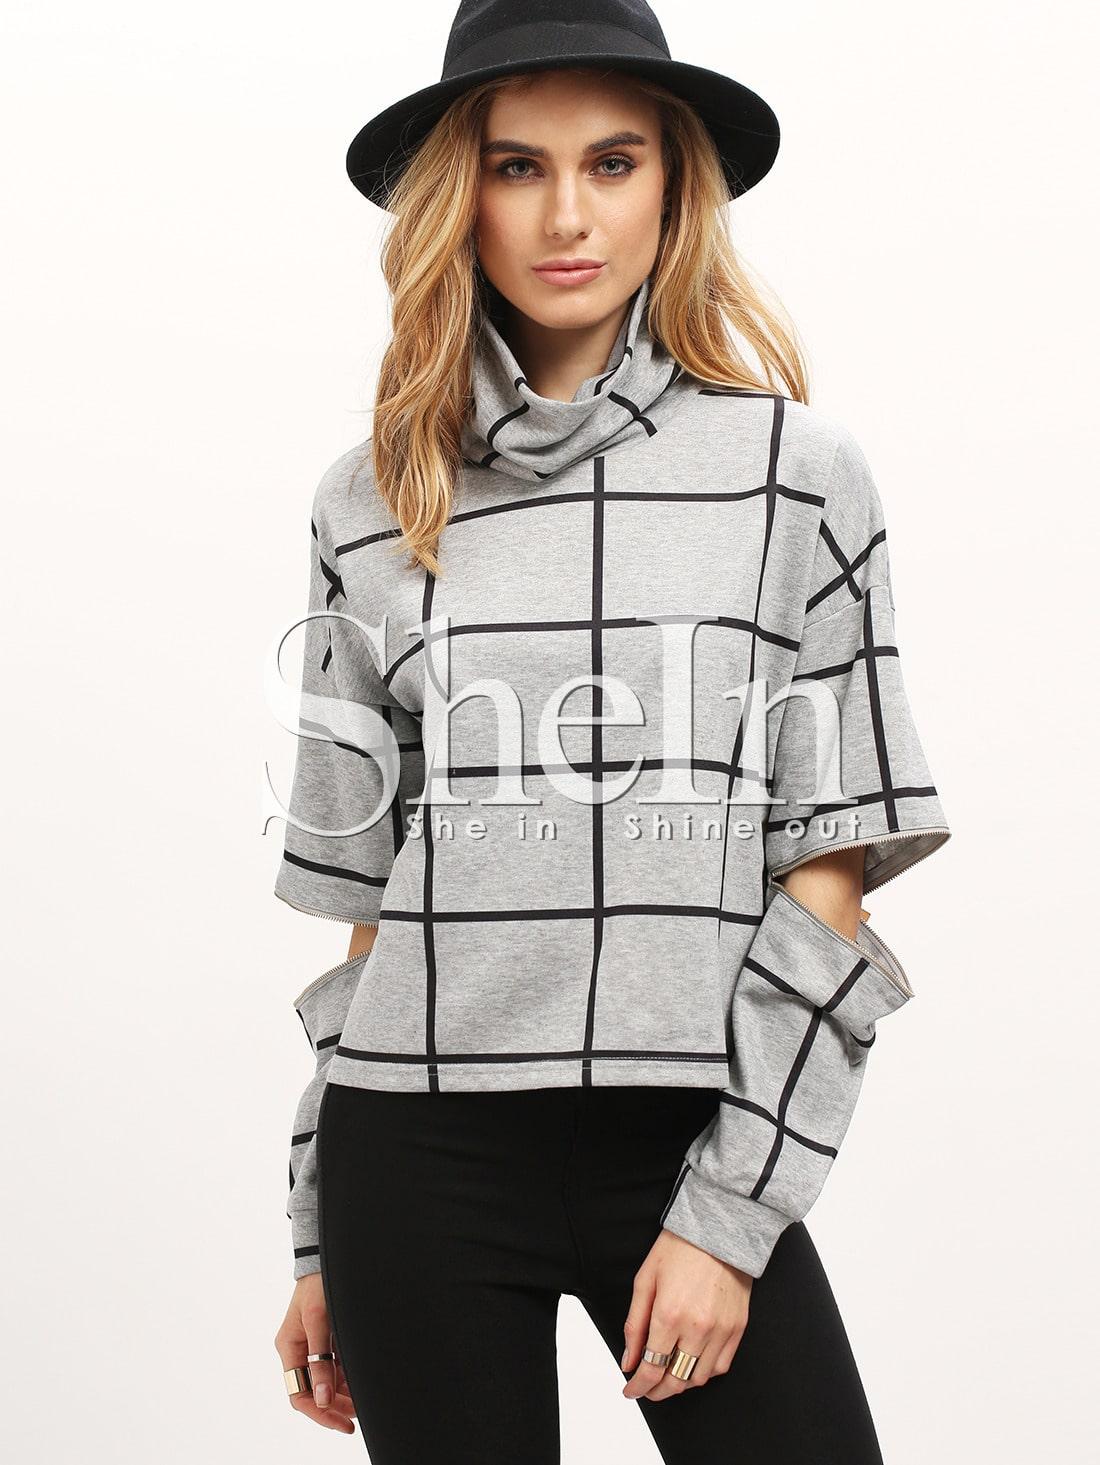 Grey Plaid High Neck Ripped SweatshirtGrey Plaid High Neck Ripped Sweatshirt<br><br>color: Grey<br>size: S